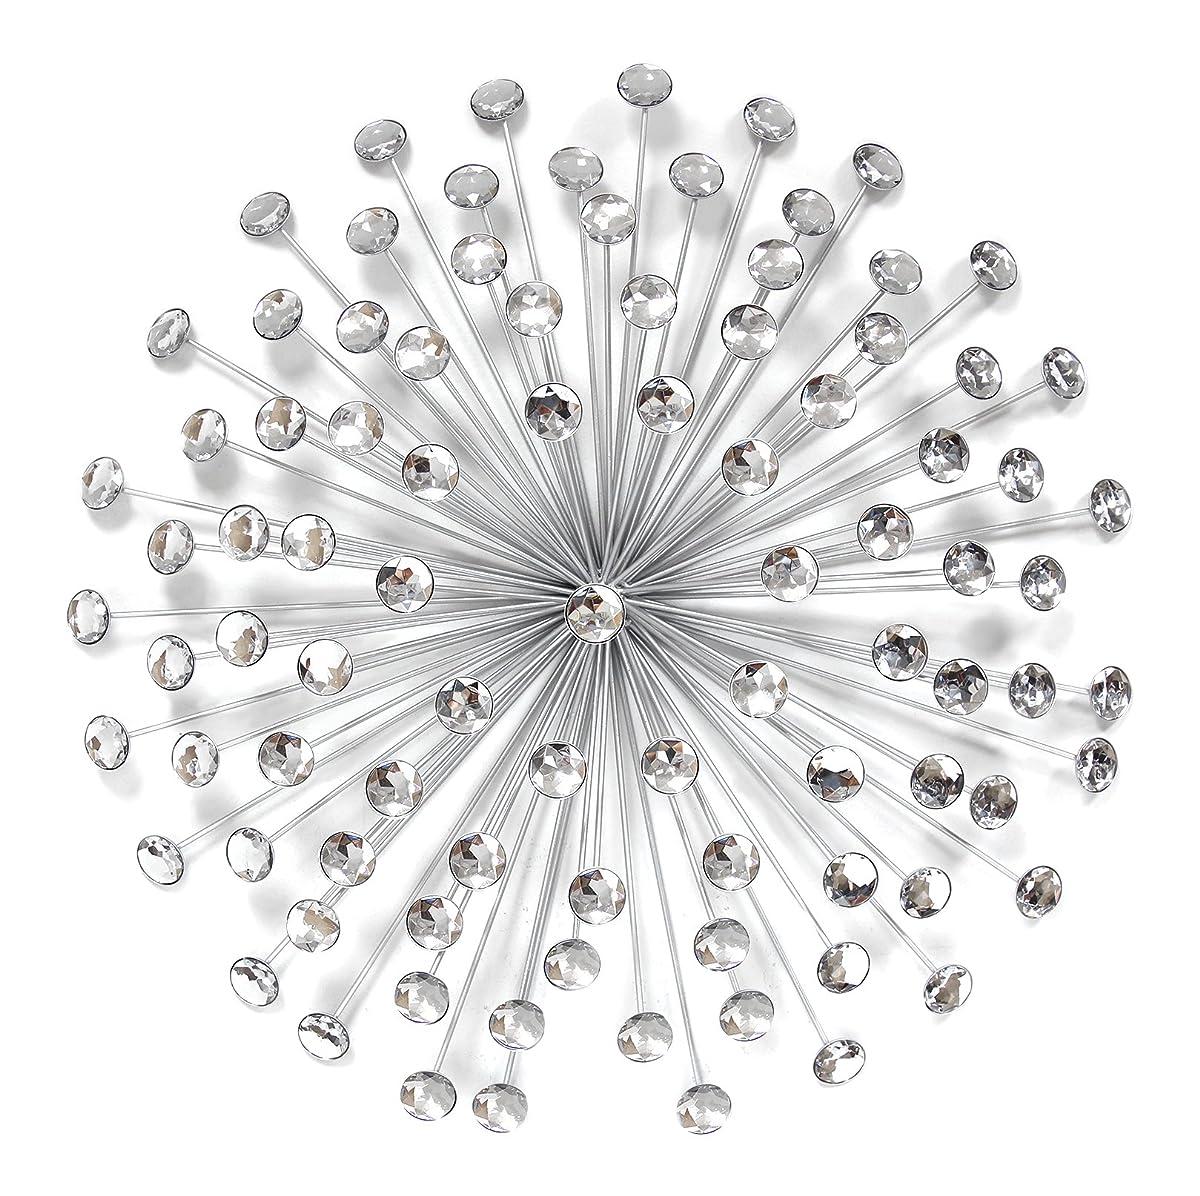 stratton home decor shd0192 acrylic burst wall decor 24 silver 24. Black Bedroom Furniture Sets. Home Design Ideas